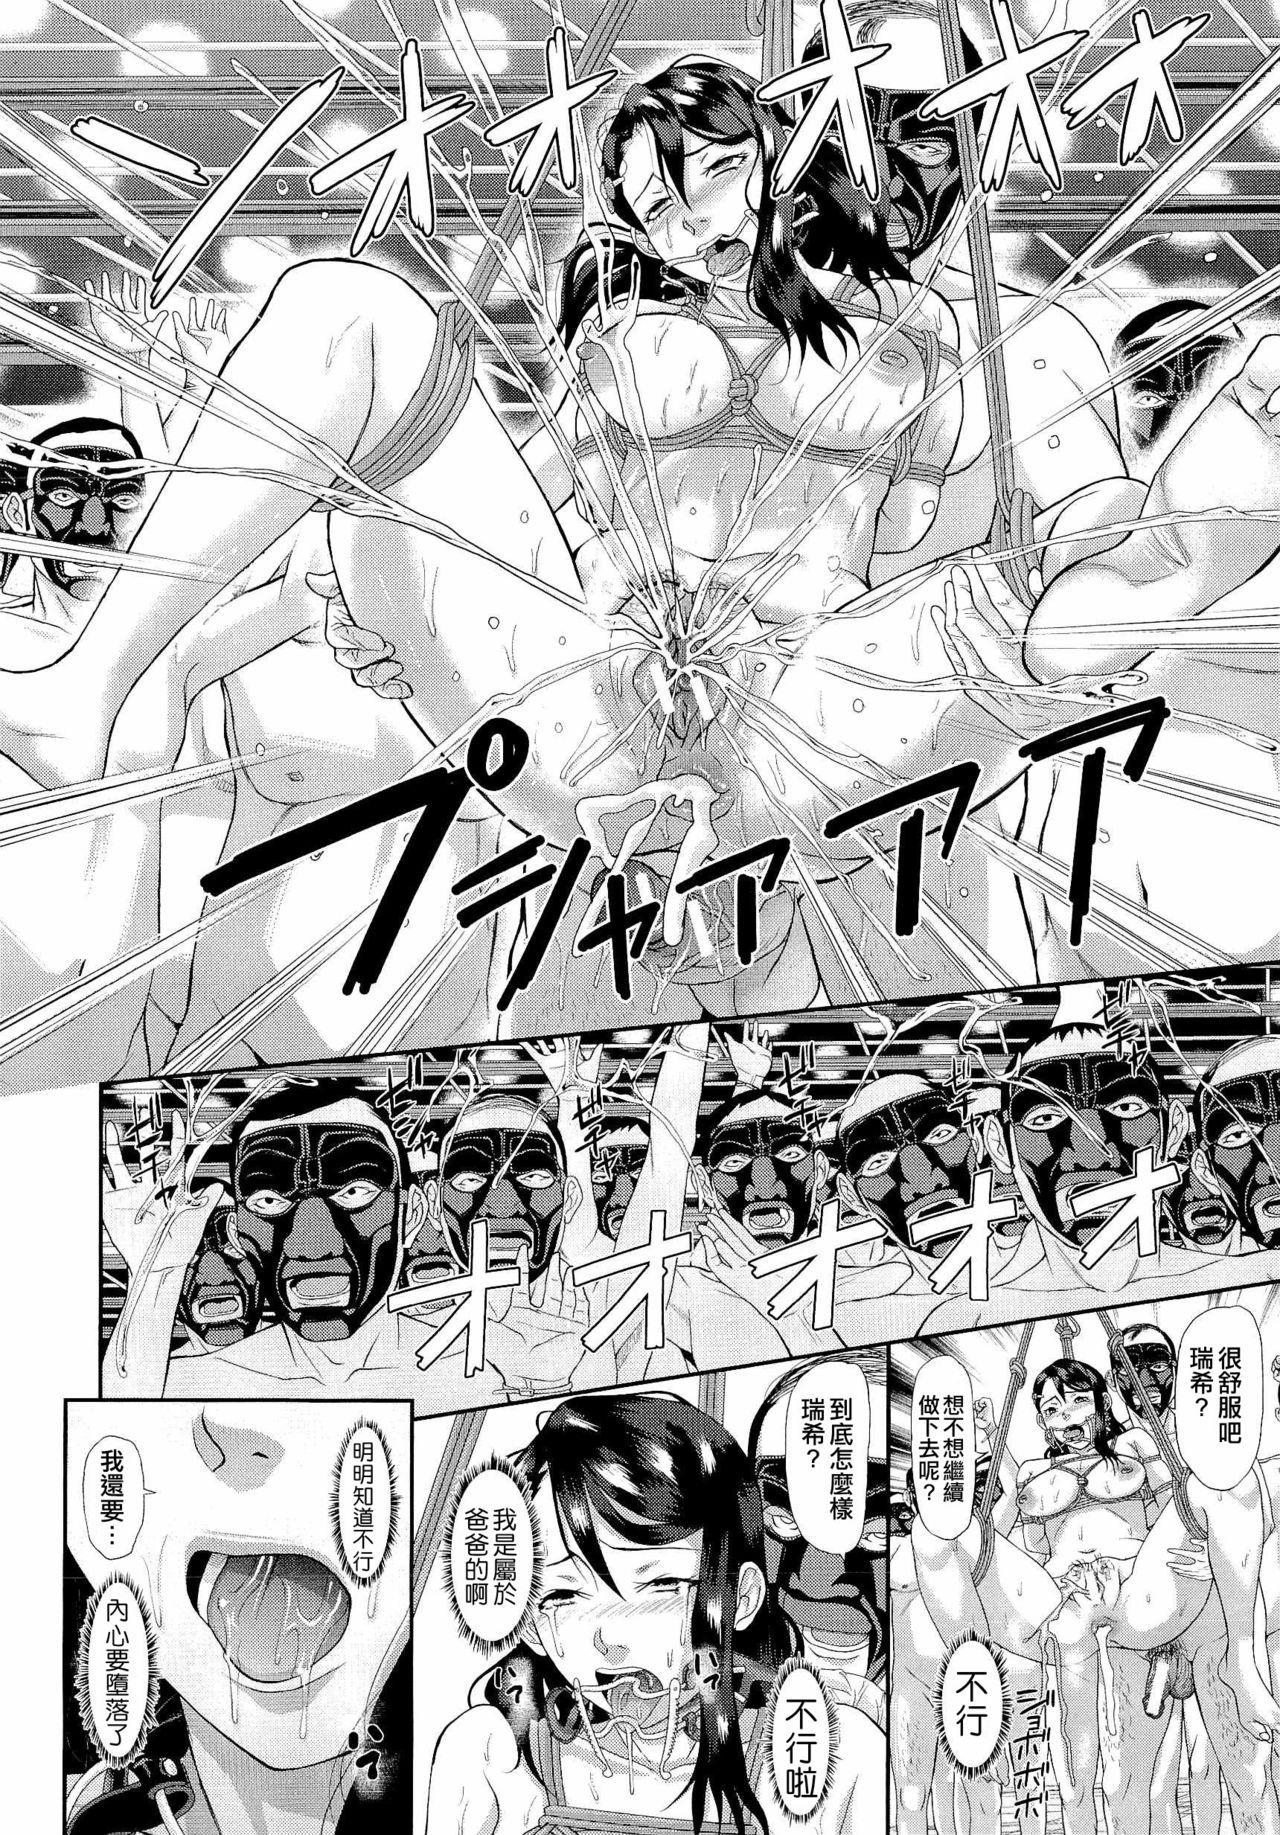 [Honebuto Danshaku] Innou Kaizou Program ~Oyako Zecchou Cult Ochi~ [Chinese]【不想记名重嵌--高质量图源】 188